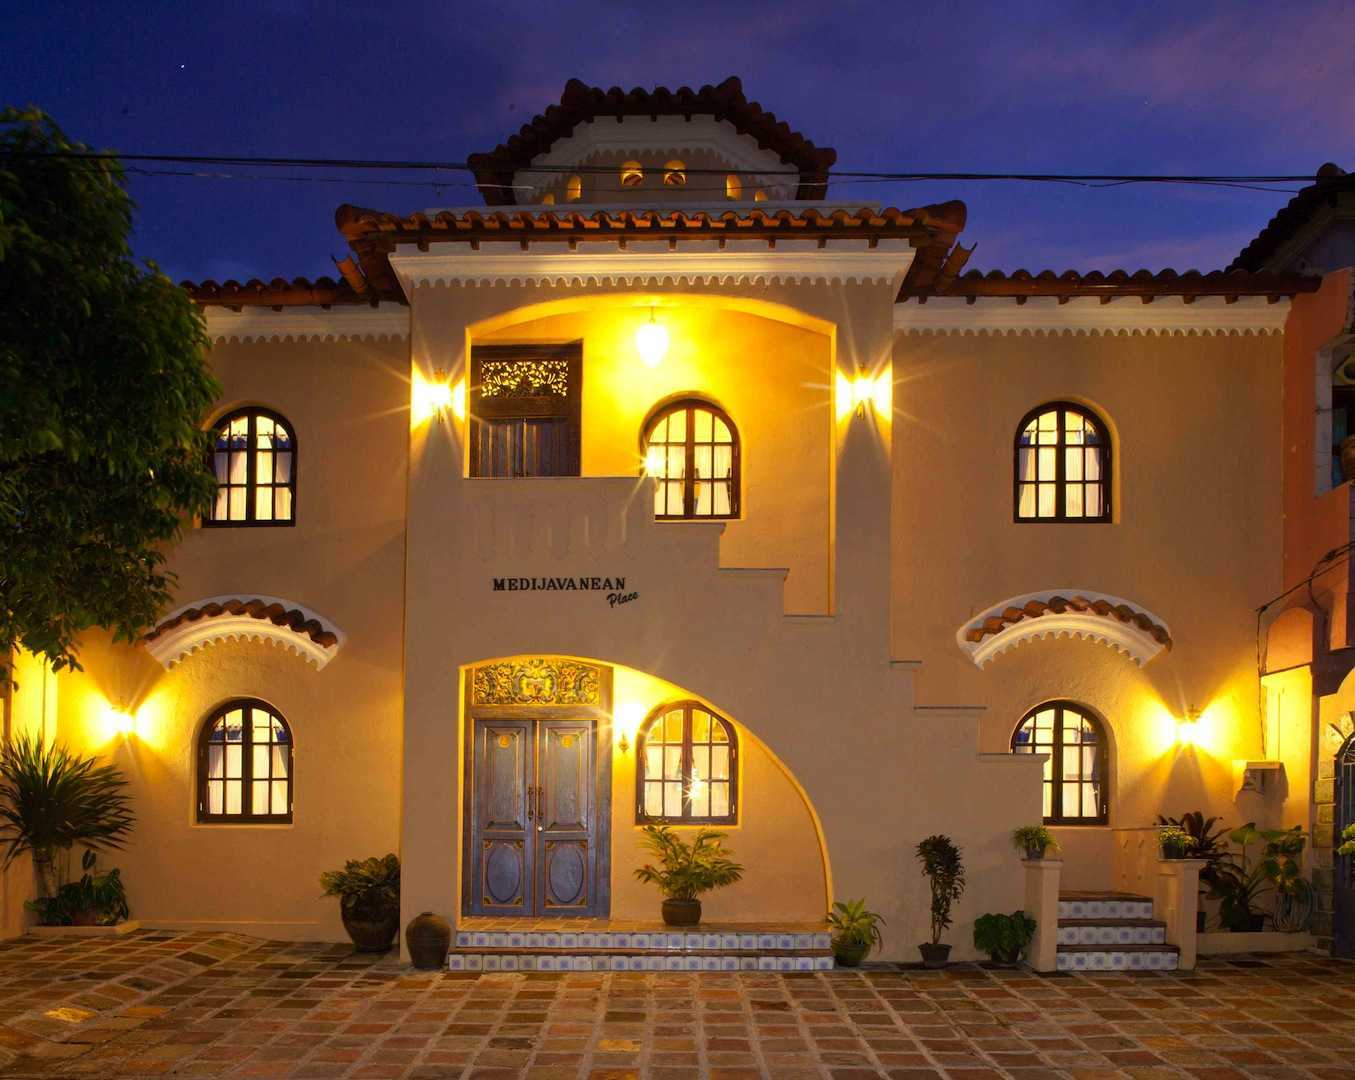 Shonny Archaul Medijavanean Place Bintaro Jaya Bintaro Jaya 8683-8684  10687